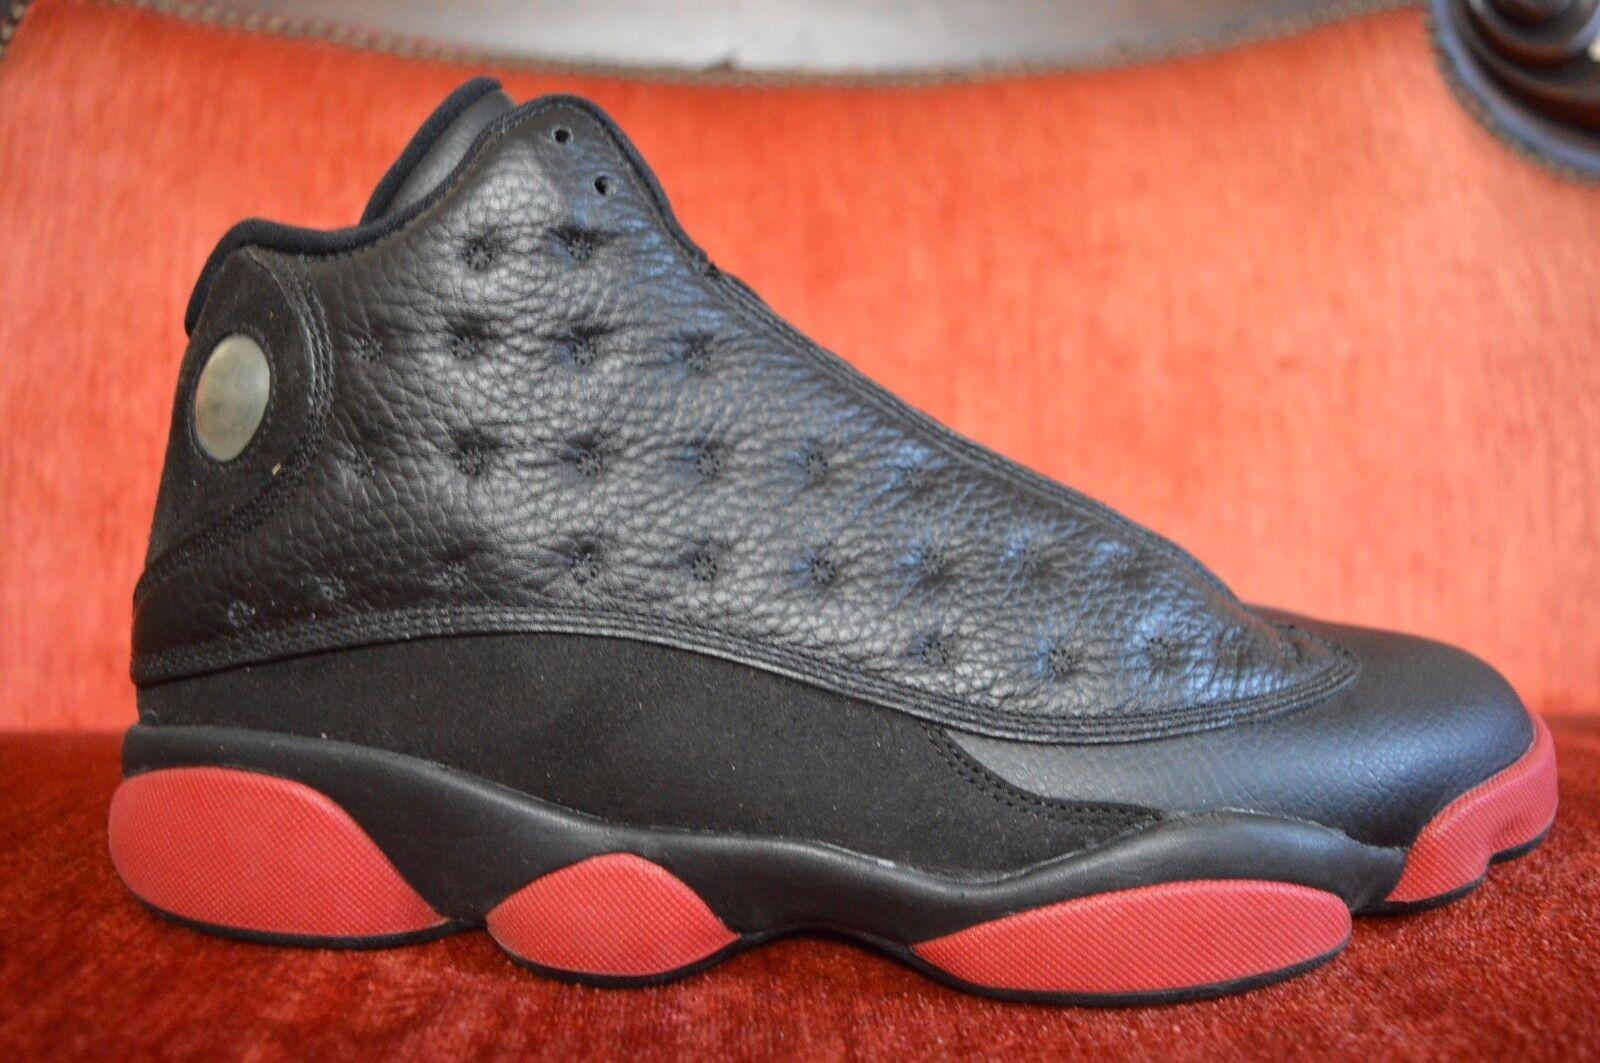 Nike air jordan sporco 13 xiii retrò sporco jordan generato nero rosso nike 414571-003 palestra taglia 11 8457bb